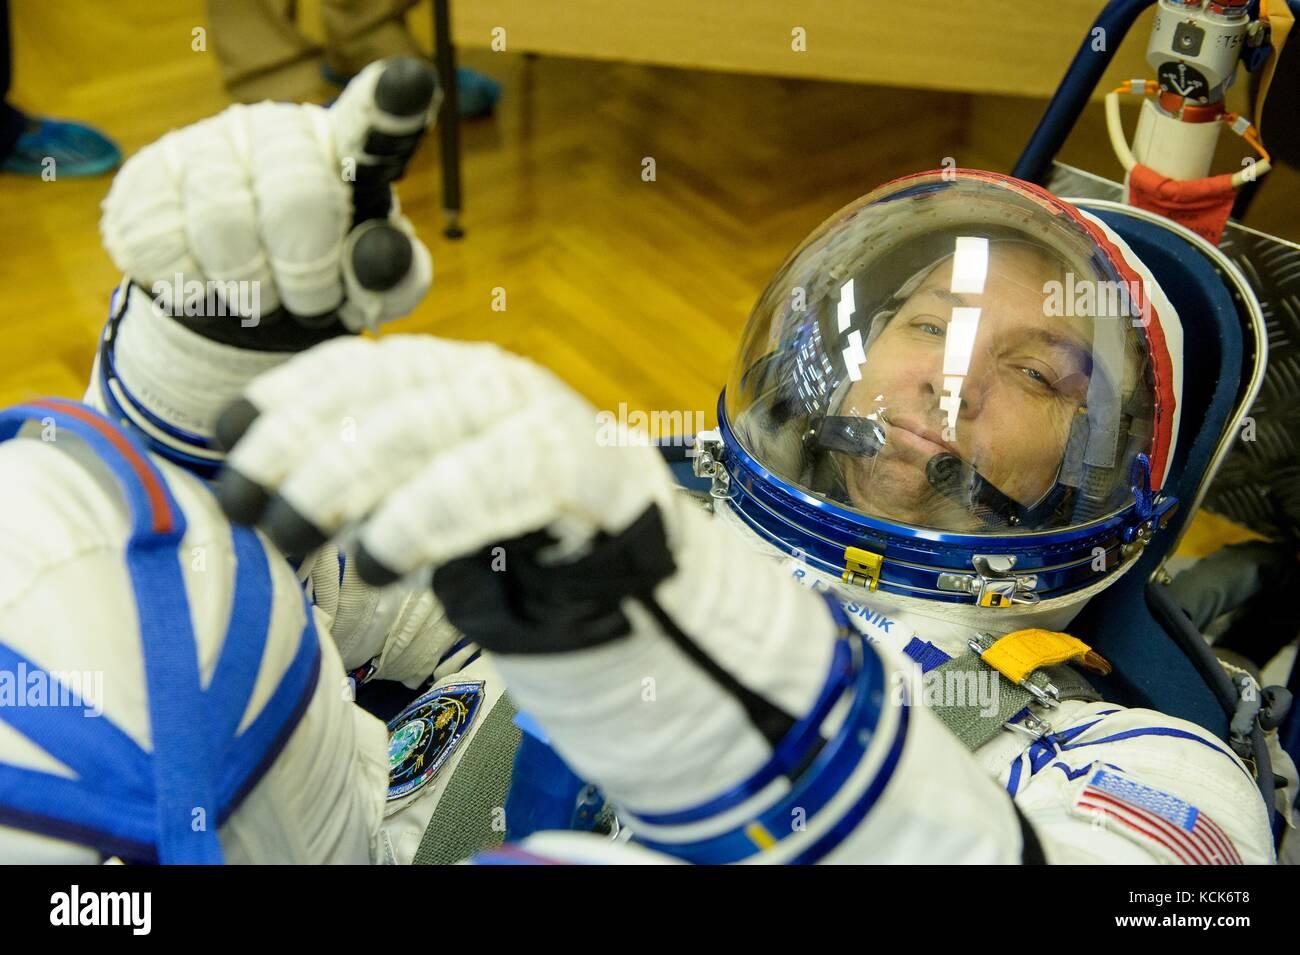 NASA International Space Station Expedition 52 prime crew member American astronaut Randy Bresnik has his Sokol Stock Photo